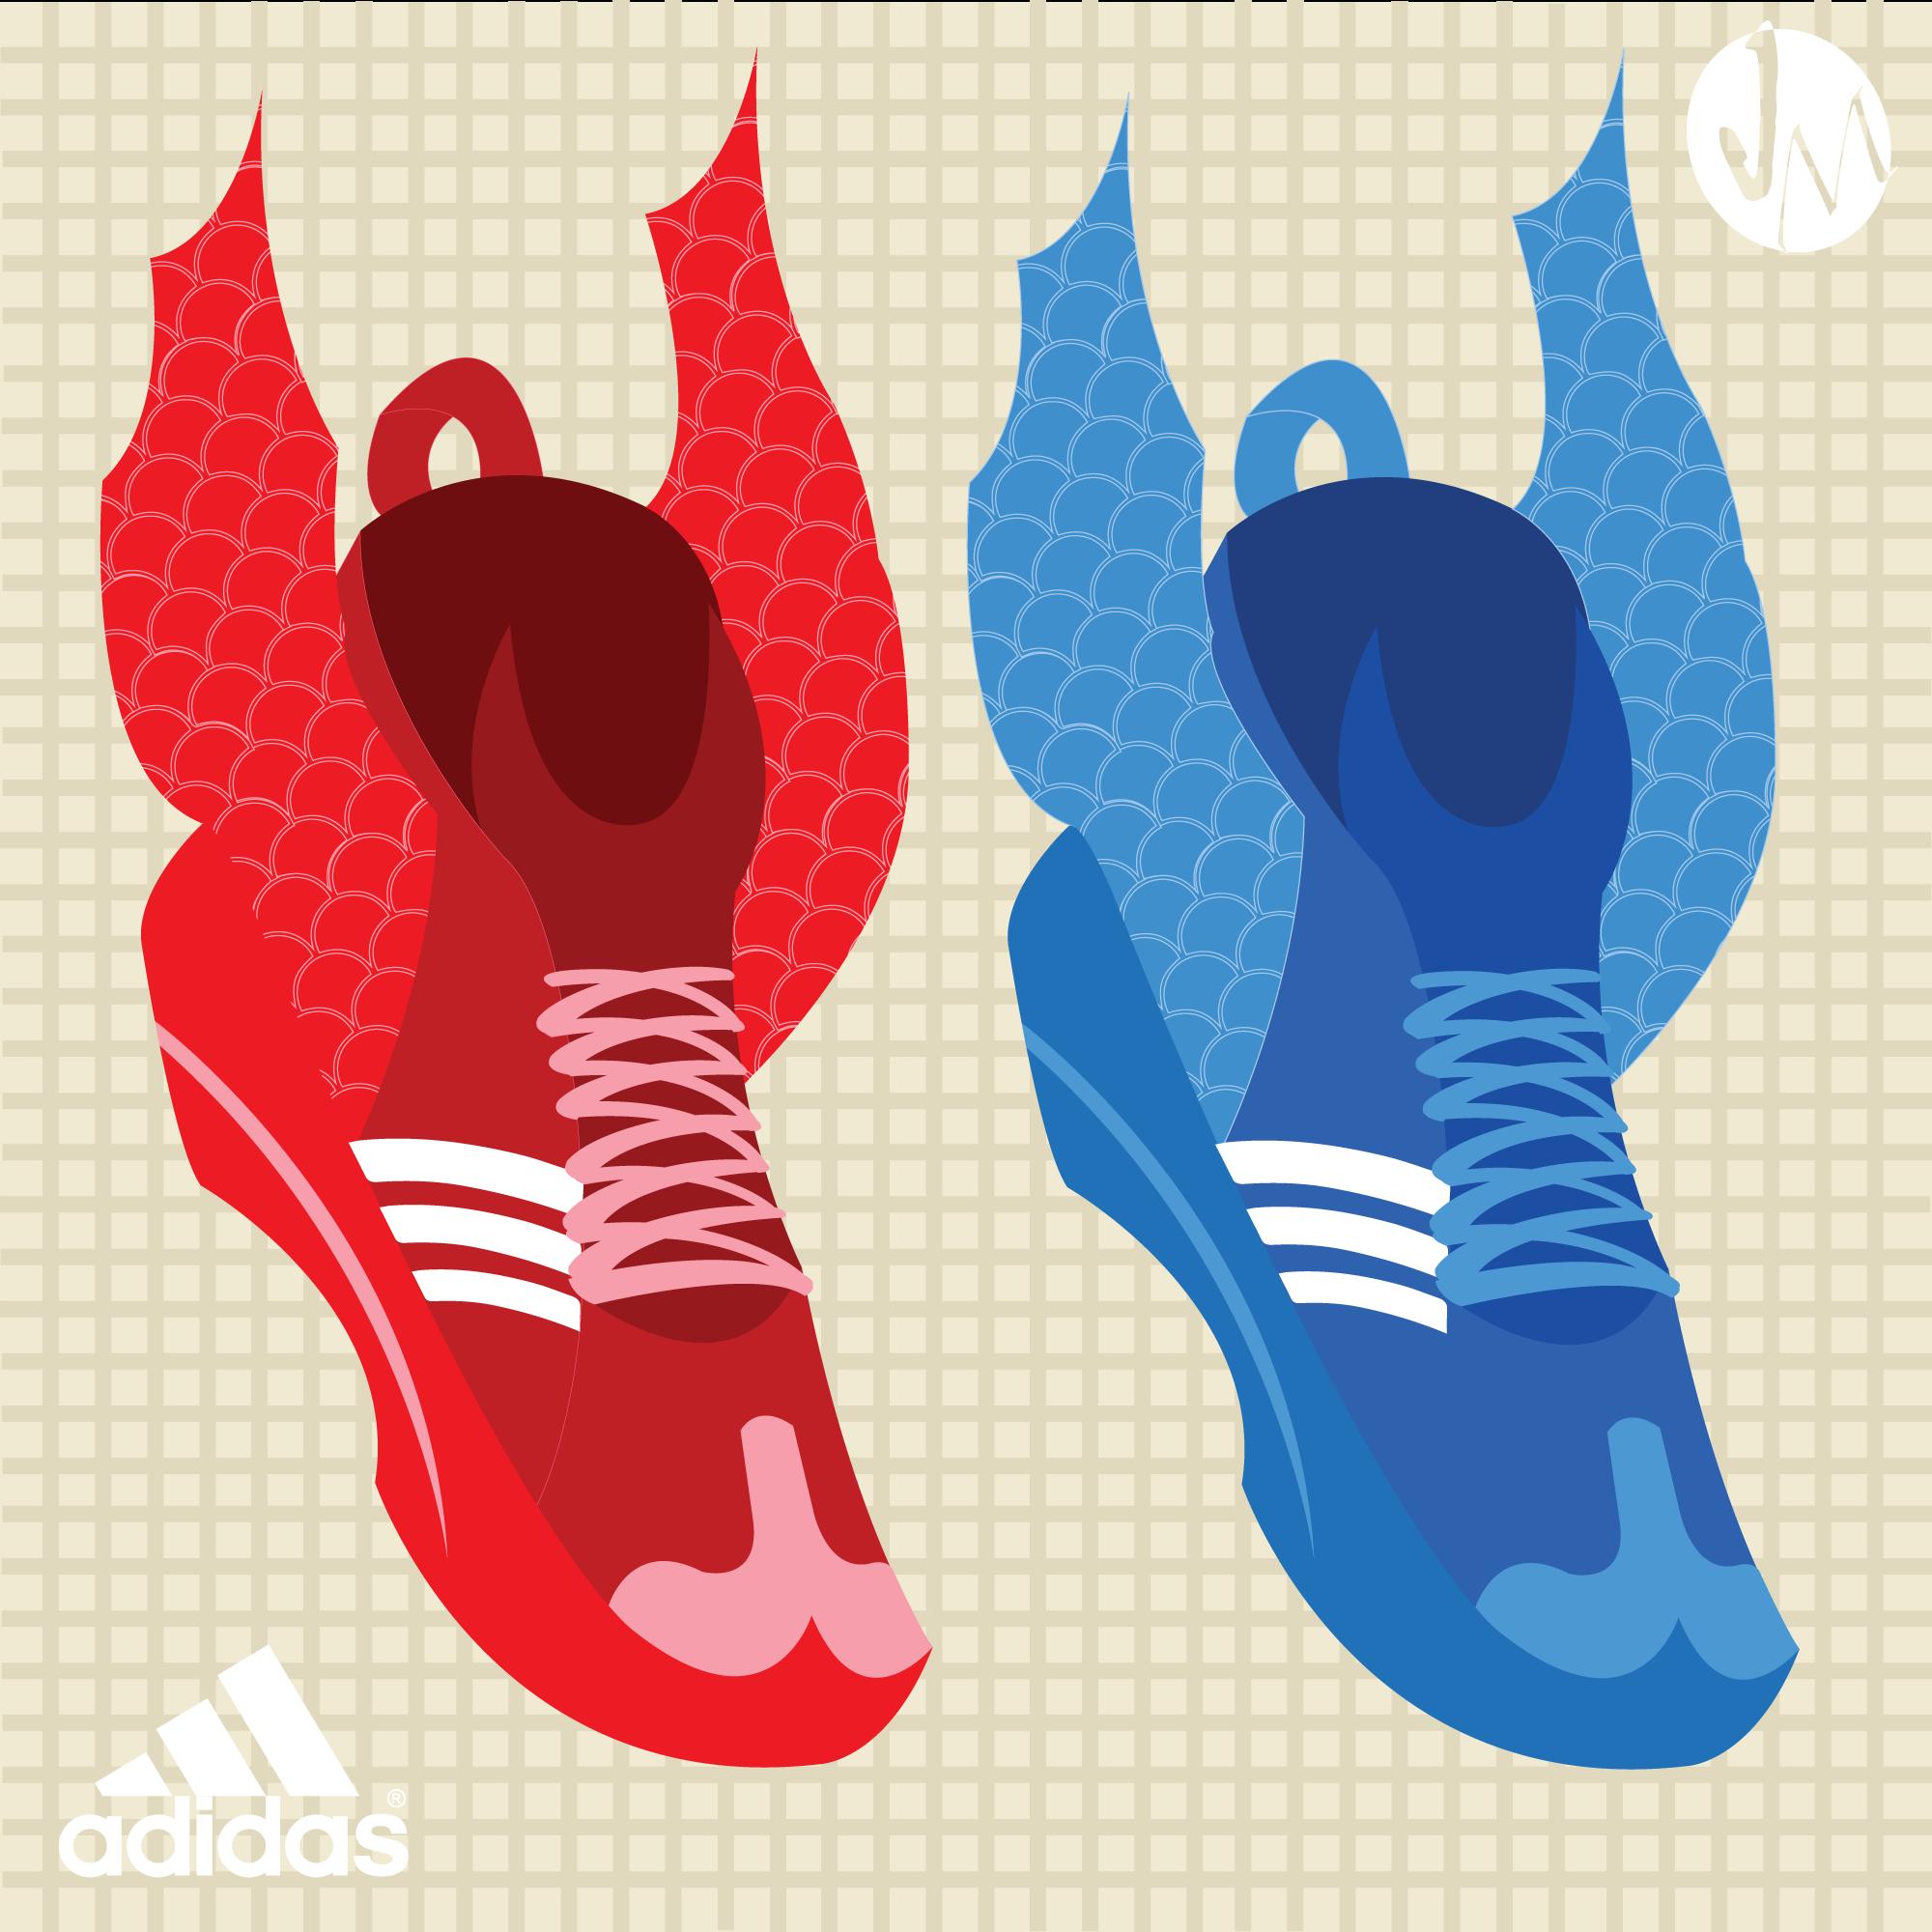 Adidas-Dragon-WingV2.png